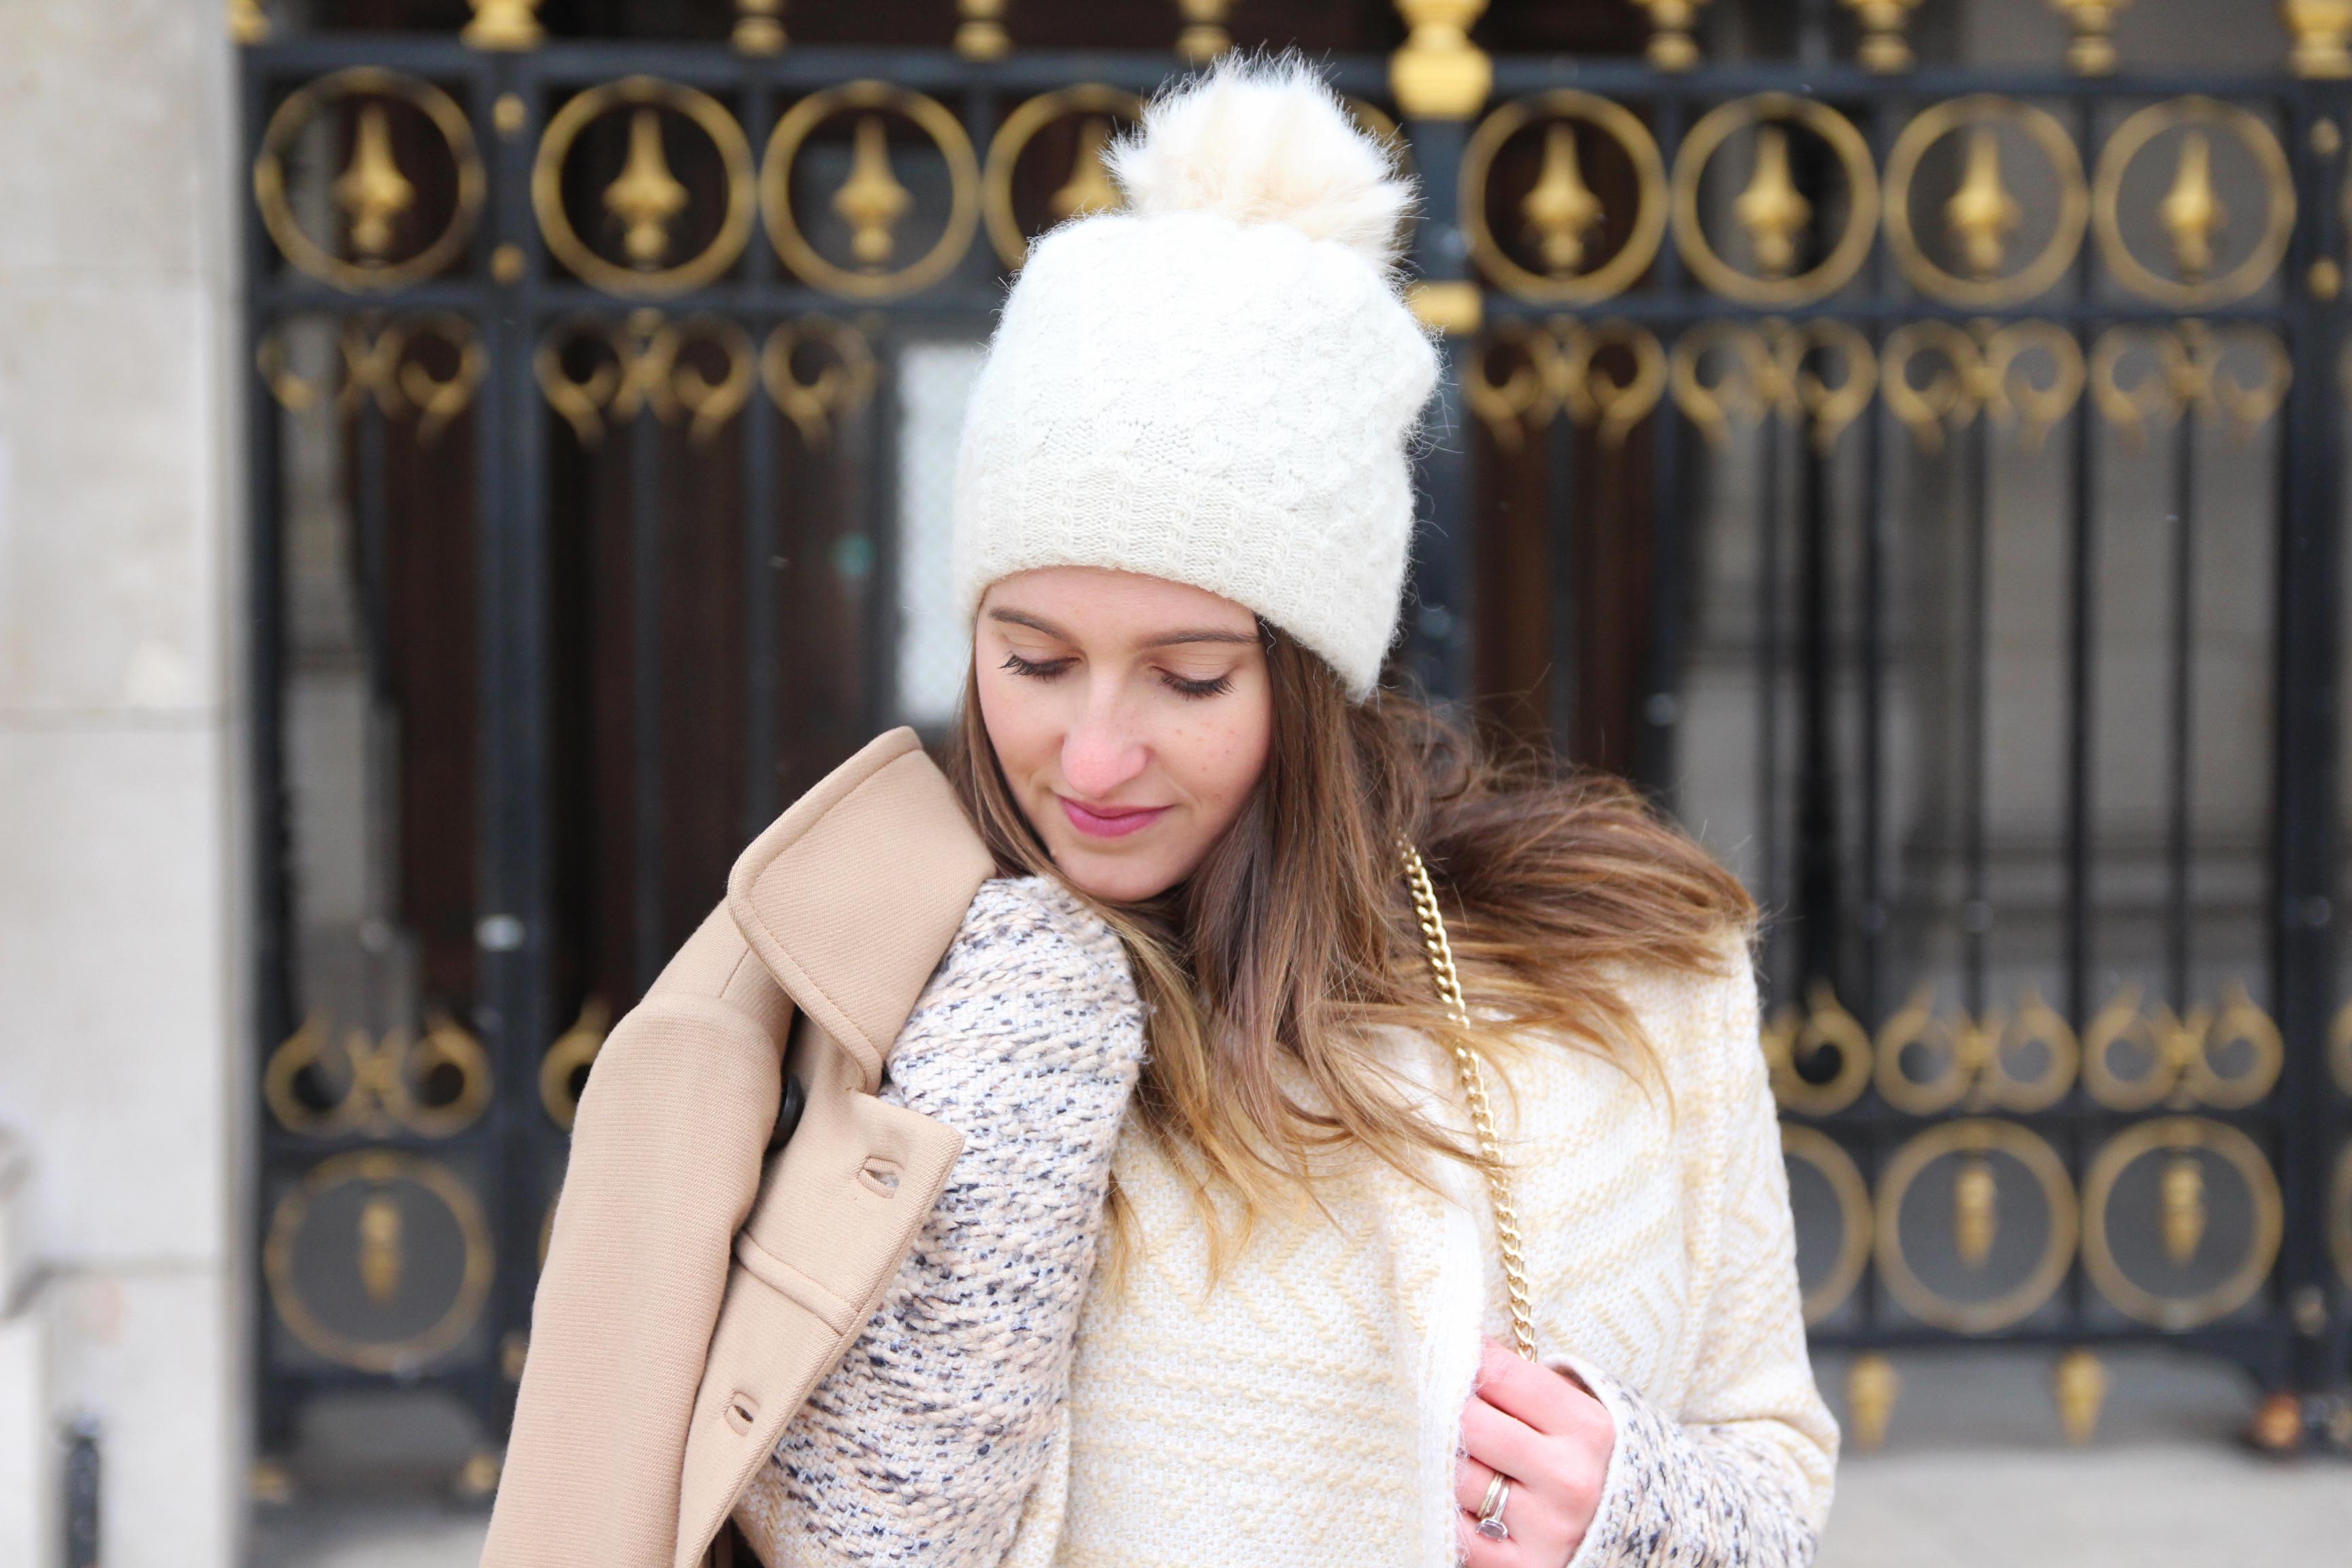 paris-opera-garnier-winter-day-influencer-style-personalstylist-imageconsultant-seralynepointcom-img_6730